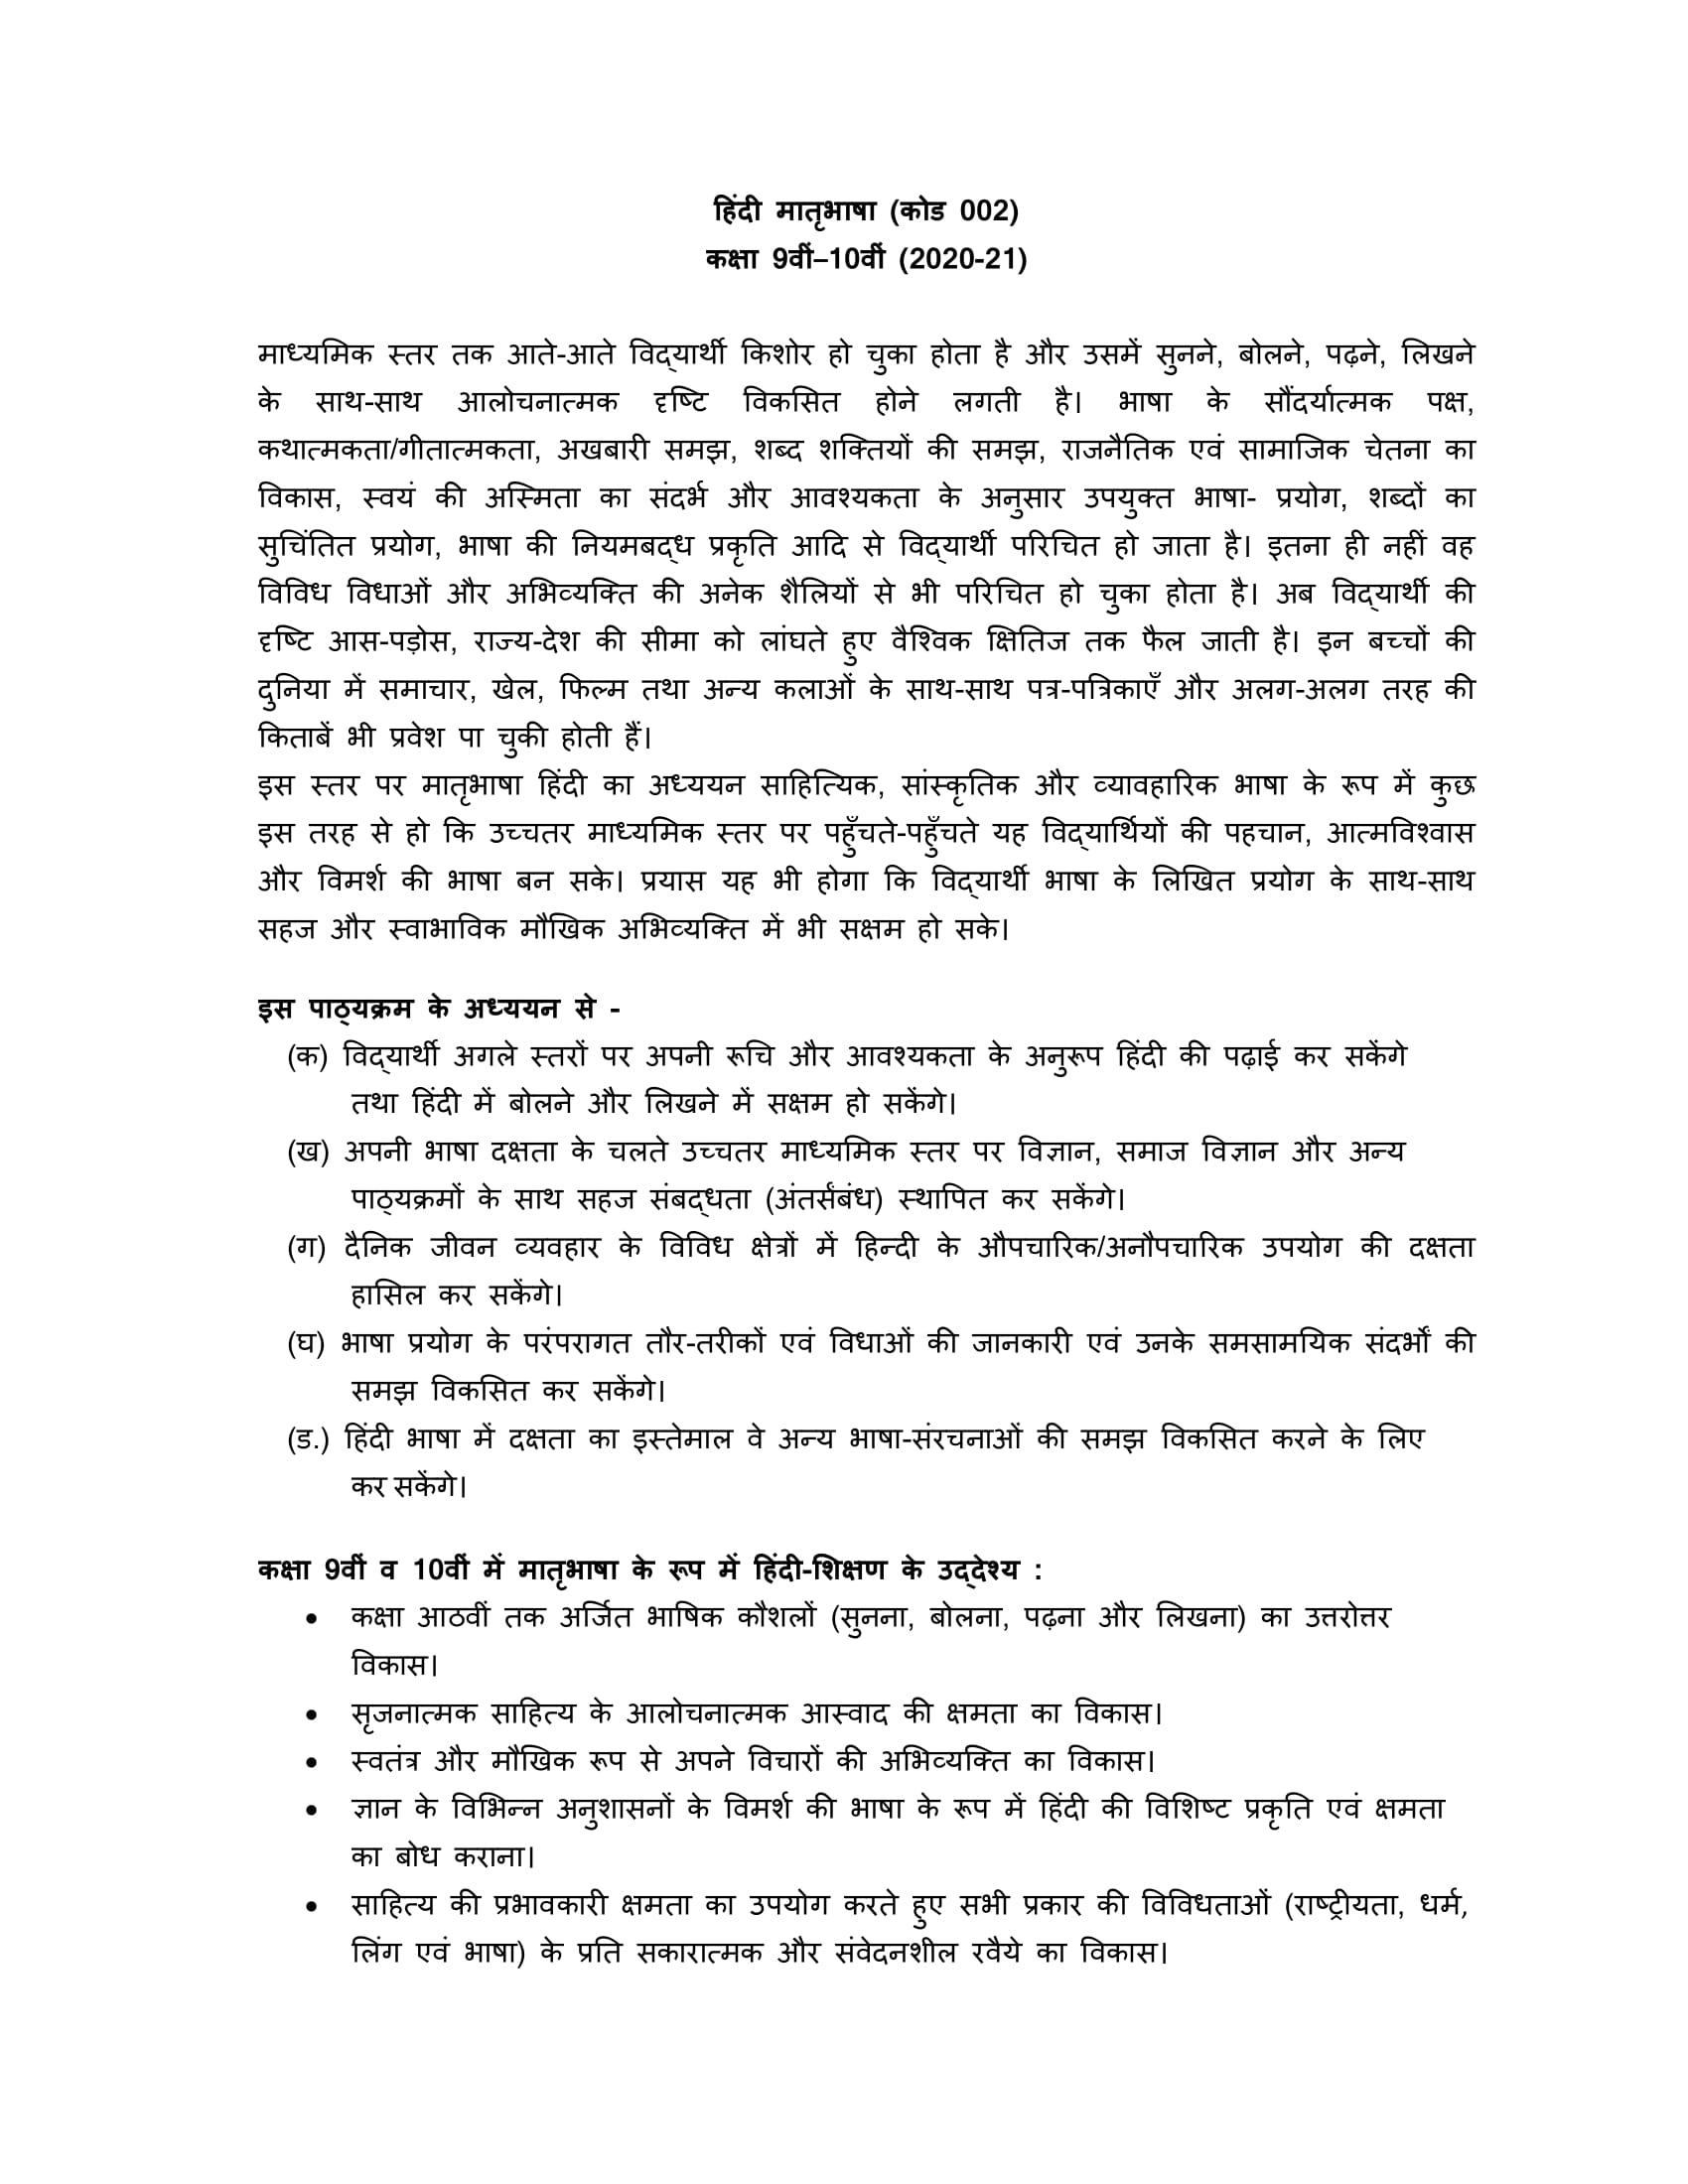 Hindi A Sec 2020 21 class 9 10 01